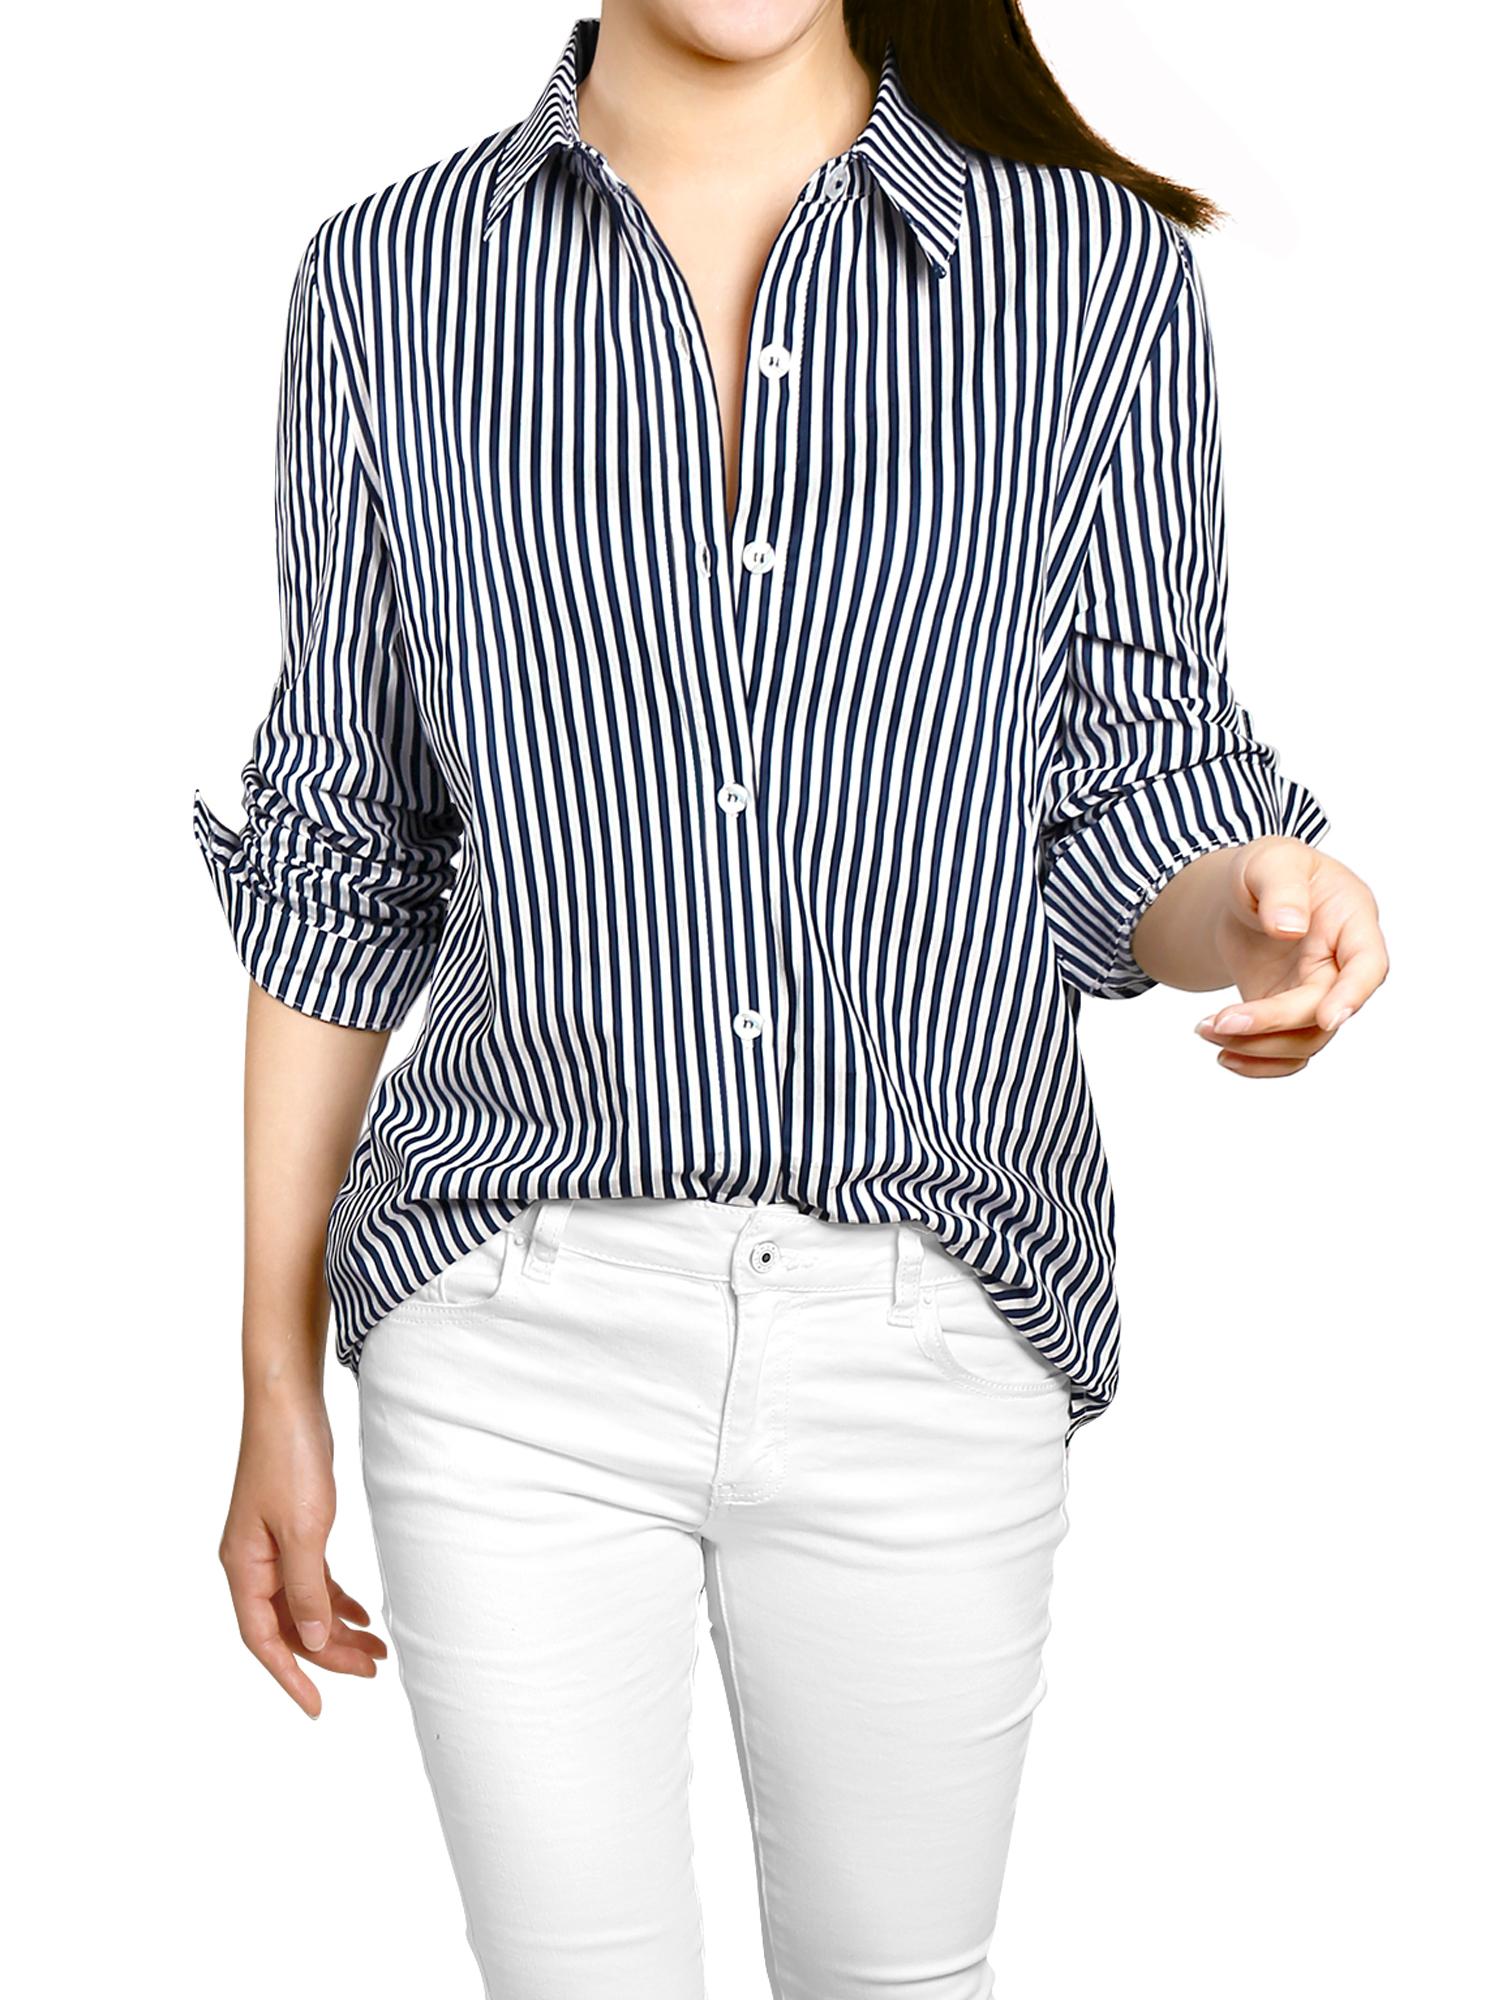 Women Striped High Low Hem Roll Up Sleeves Shirt Dark Blue White L